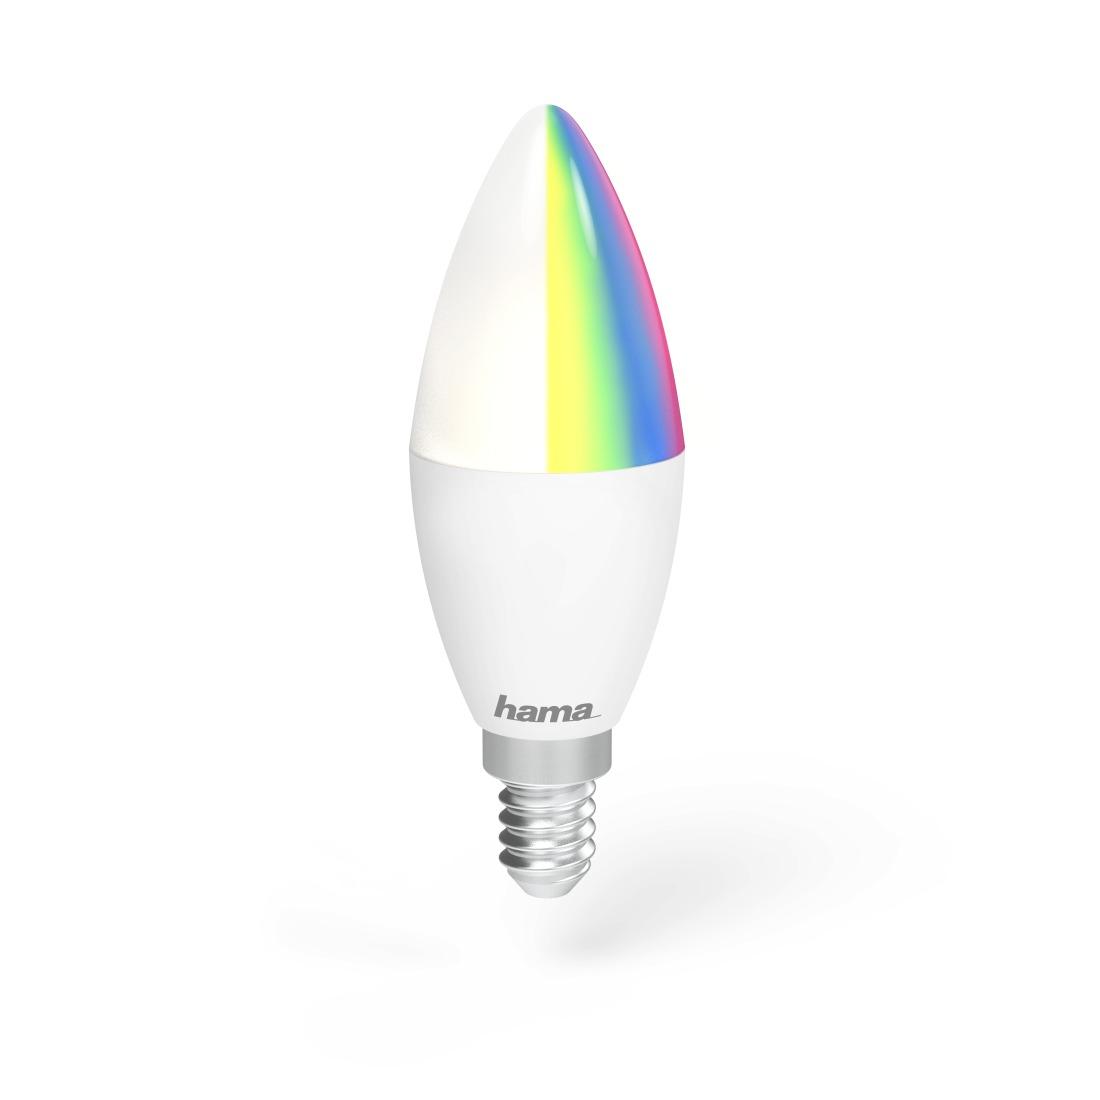 Hama Wifi-ledlamp, E14, 4,5W, RGB, dimbaar Smartverlichting